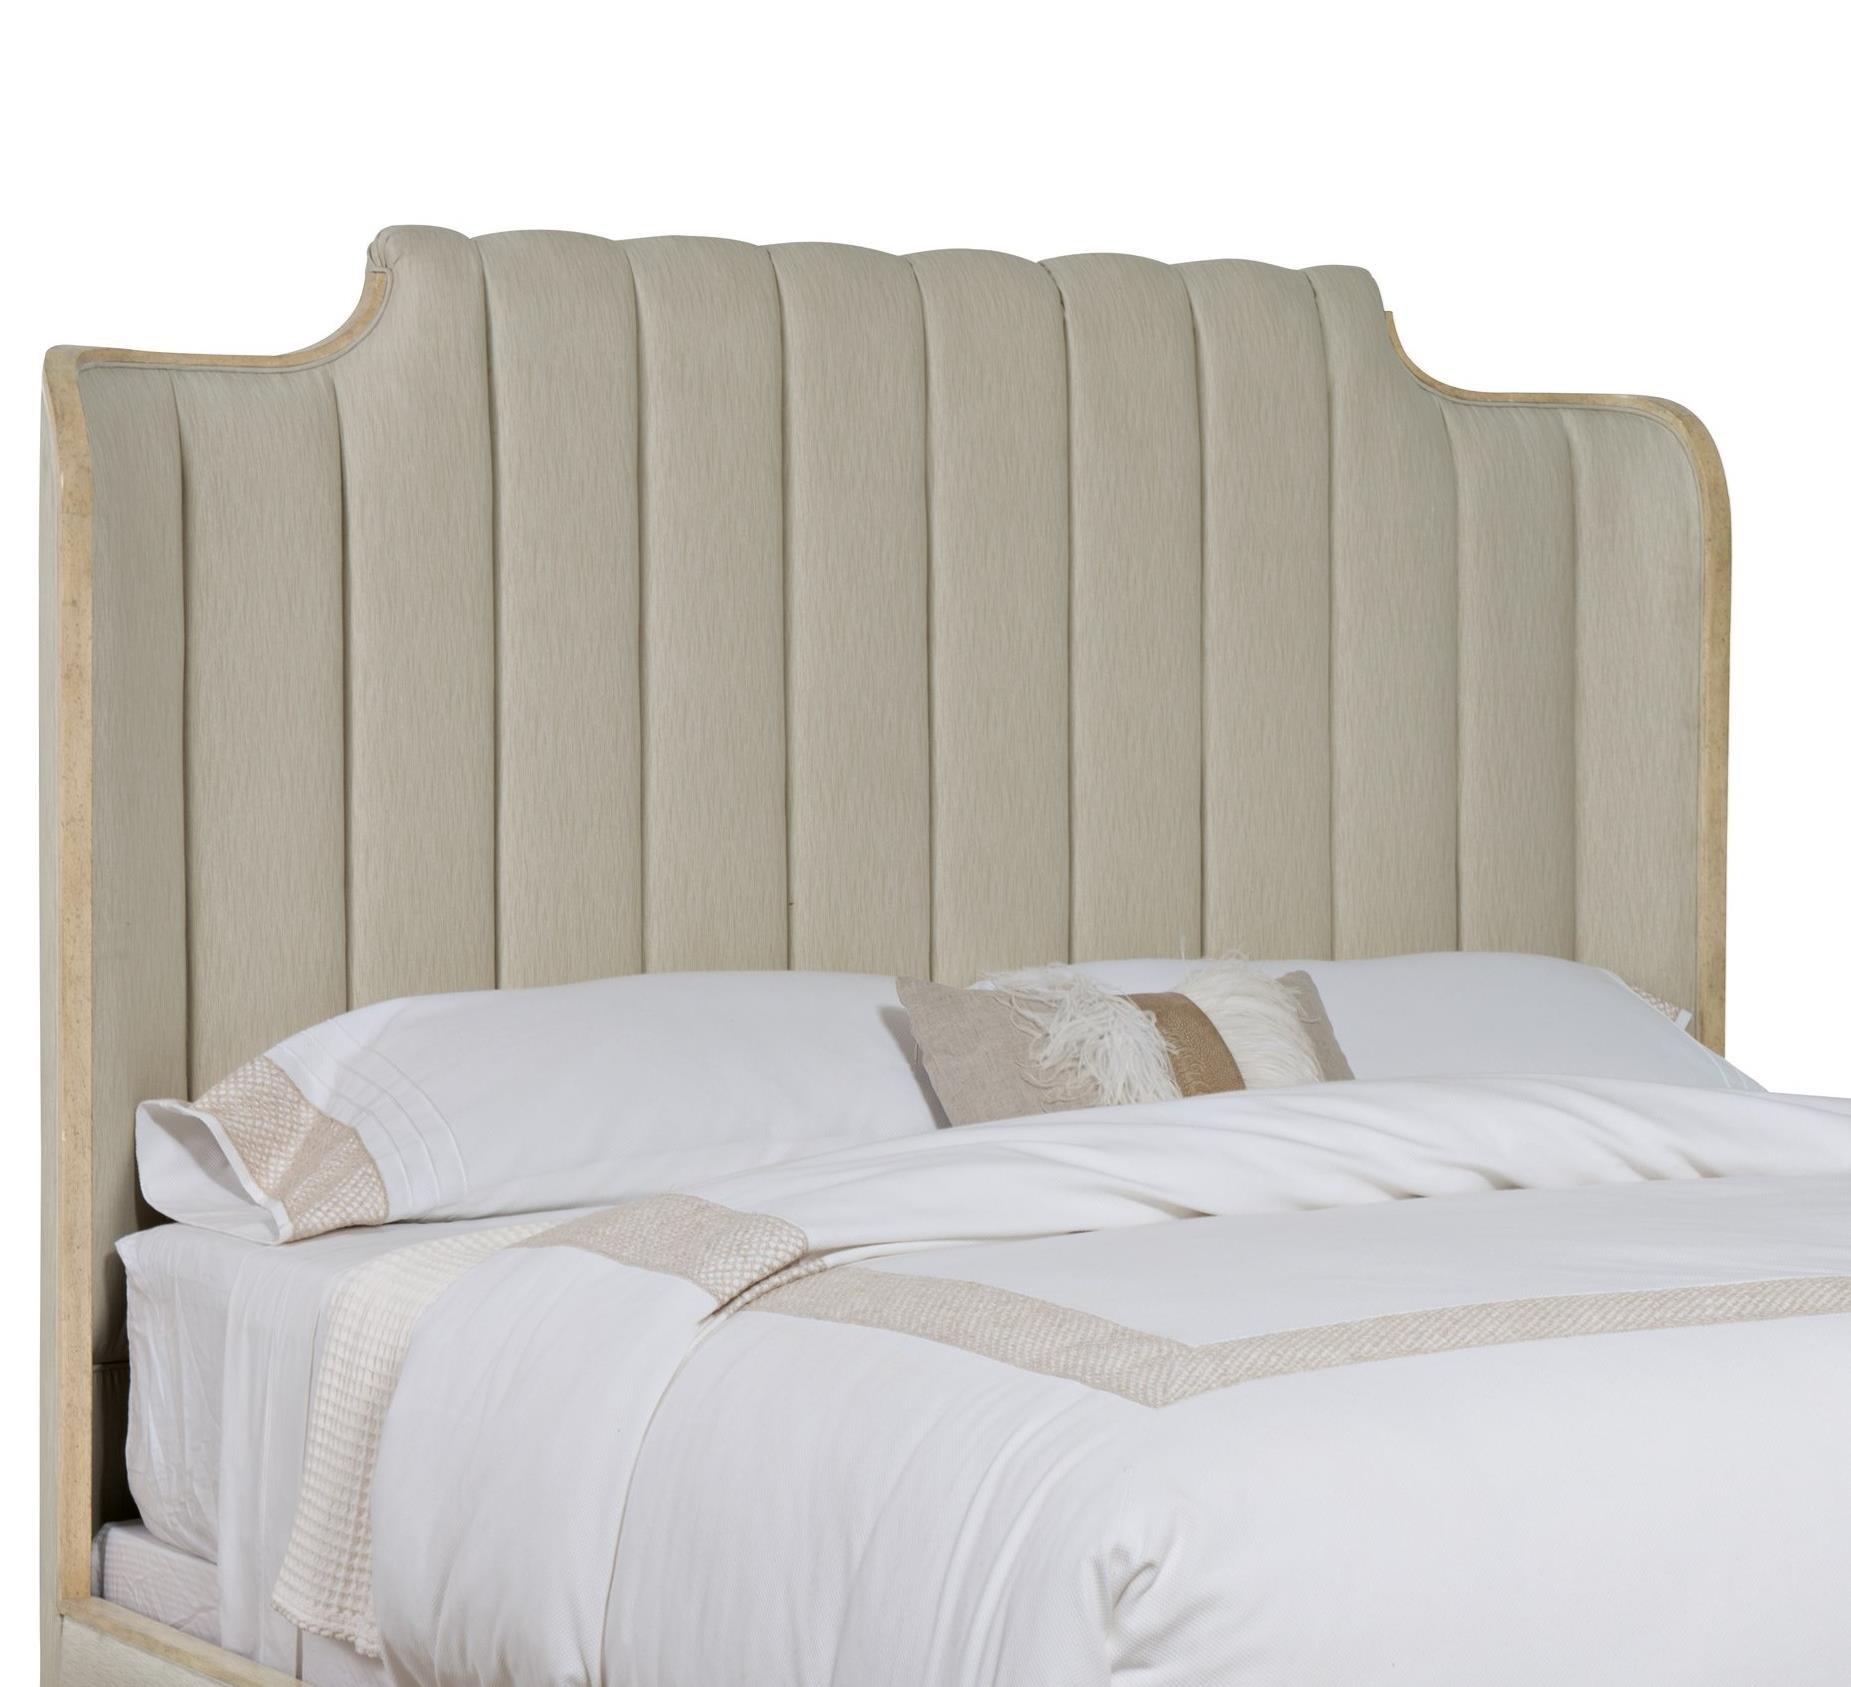 Newport Queen Upholstered Headboard by Hooker Furniture at Stoney Creek Furniture